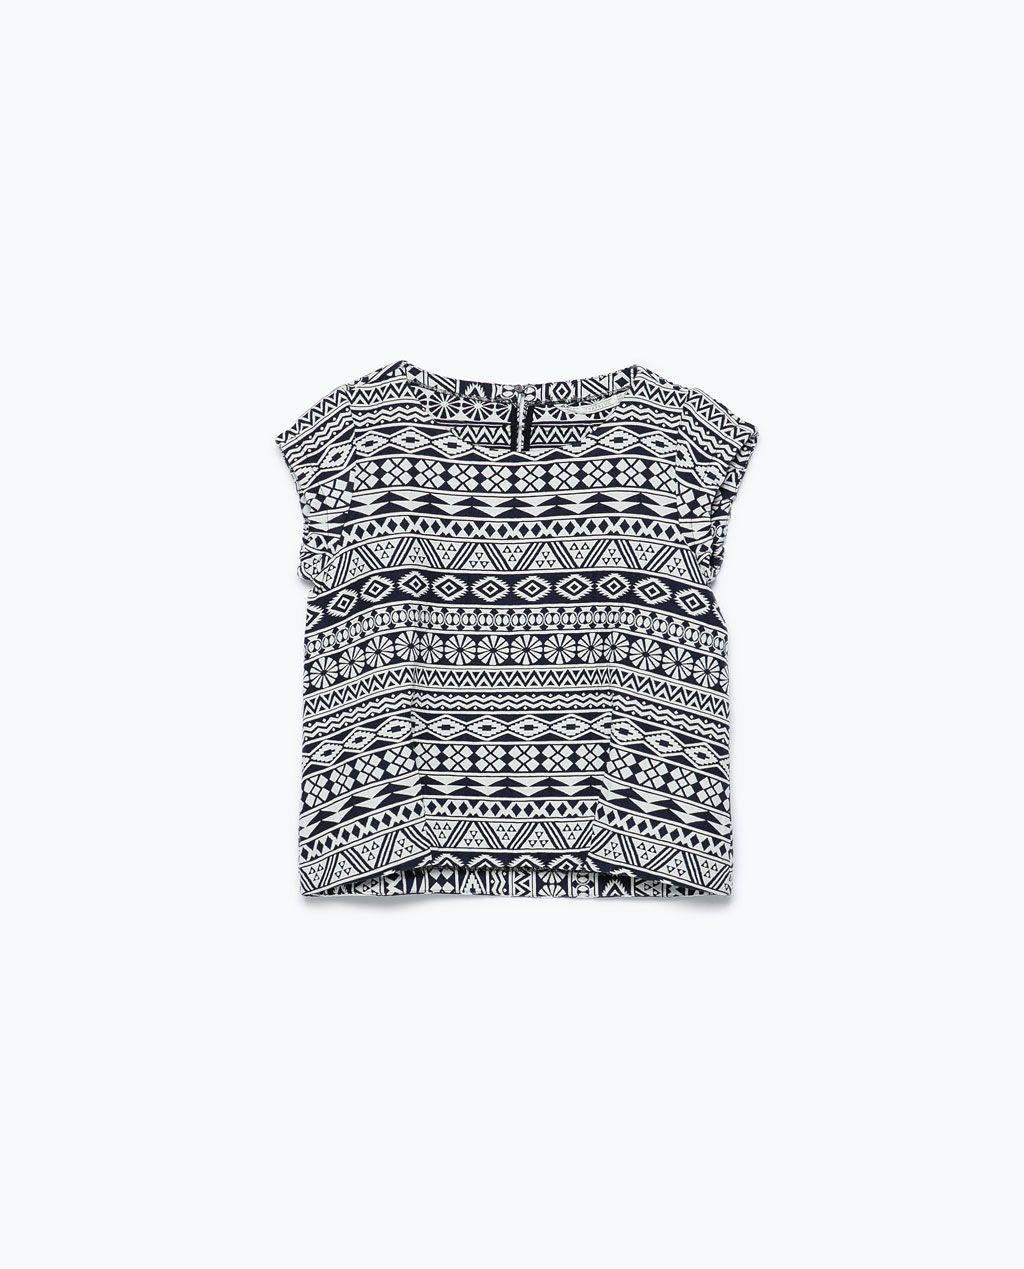 ZARA - TRF - TOP JACQUARD | Moda | Pinterest | Zara, Patrones y ...